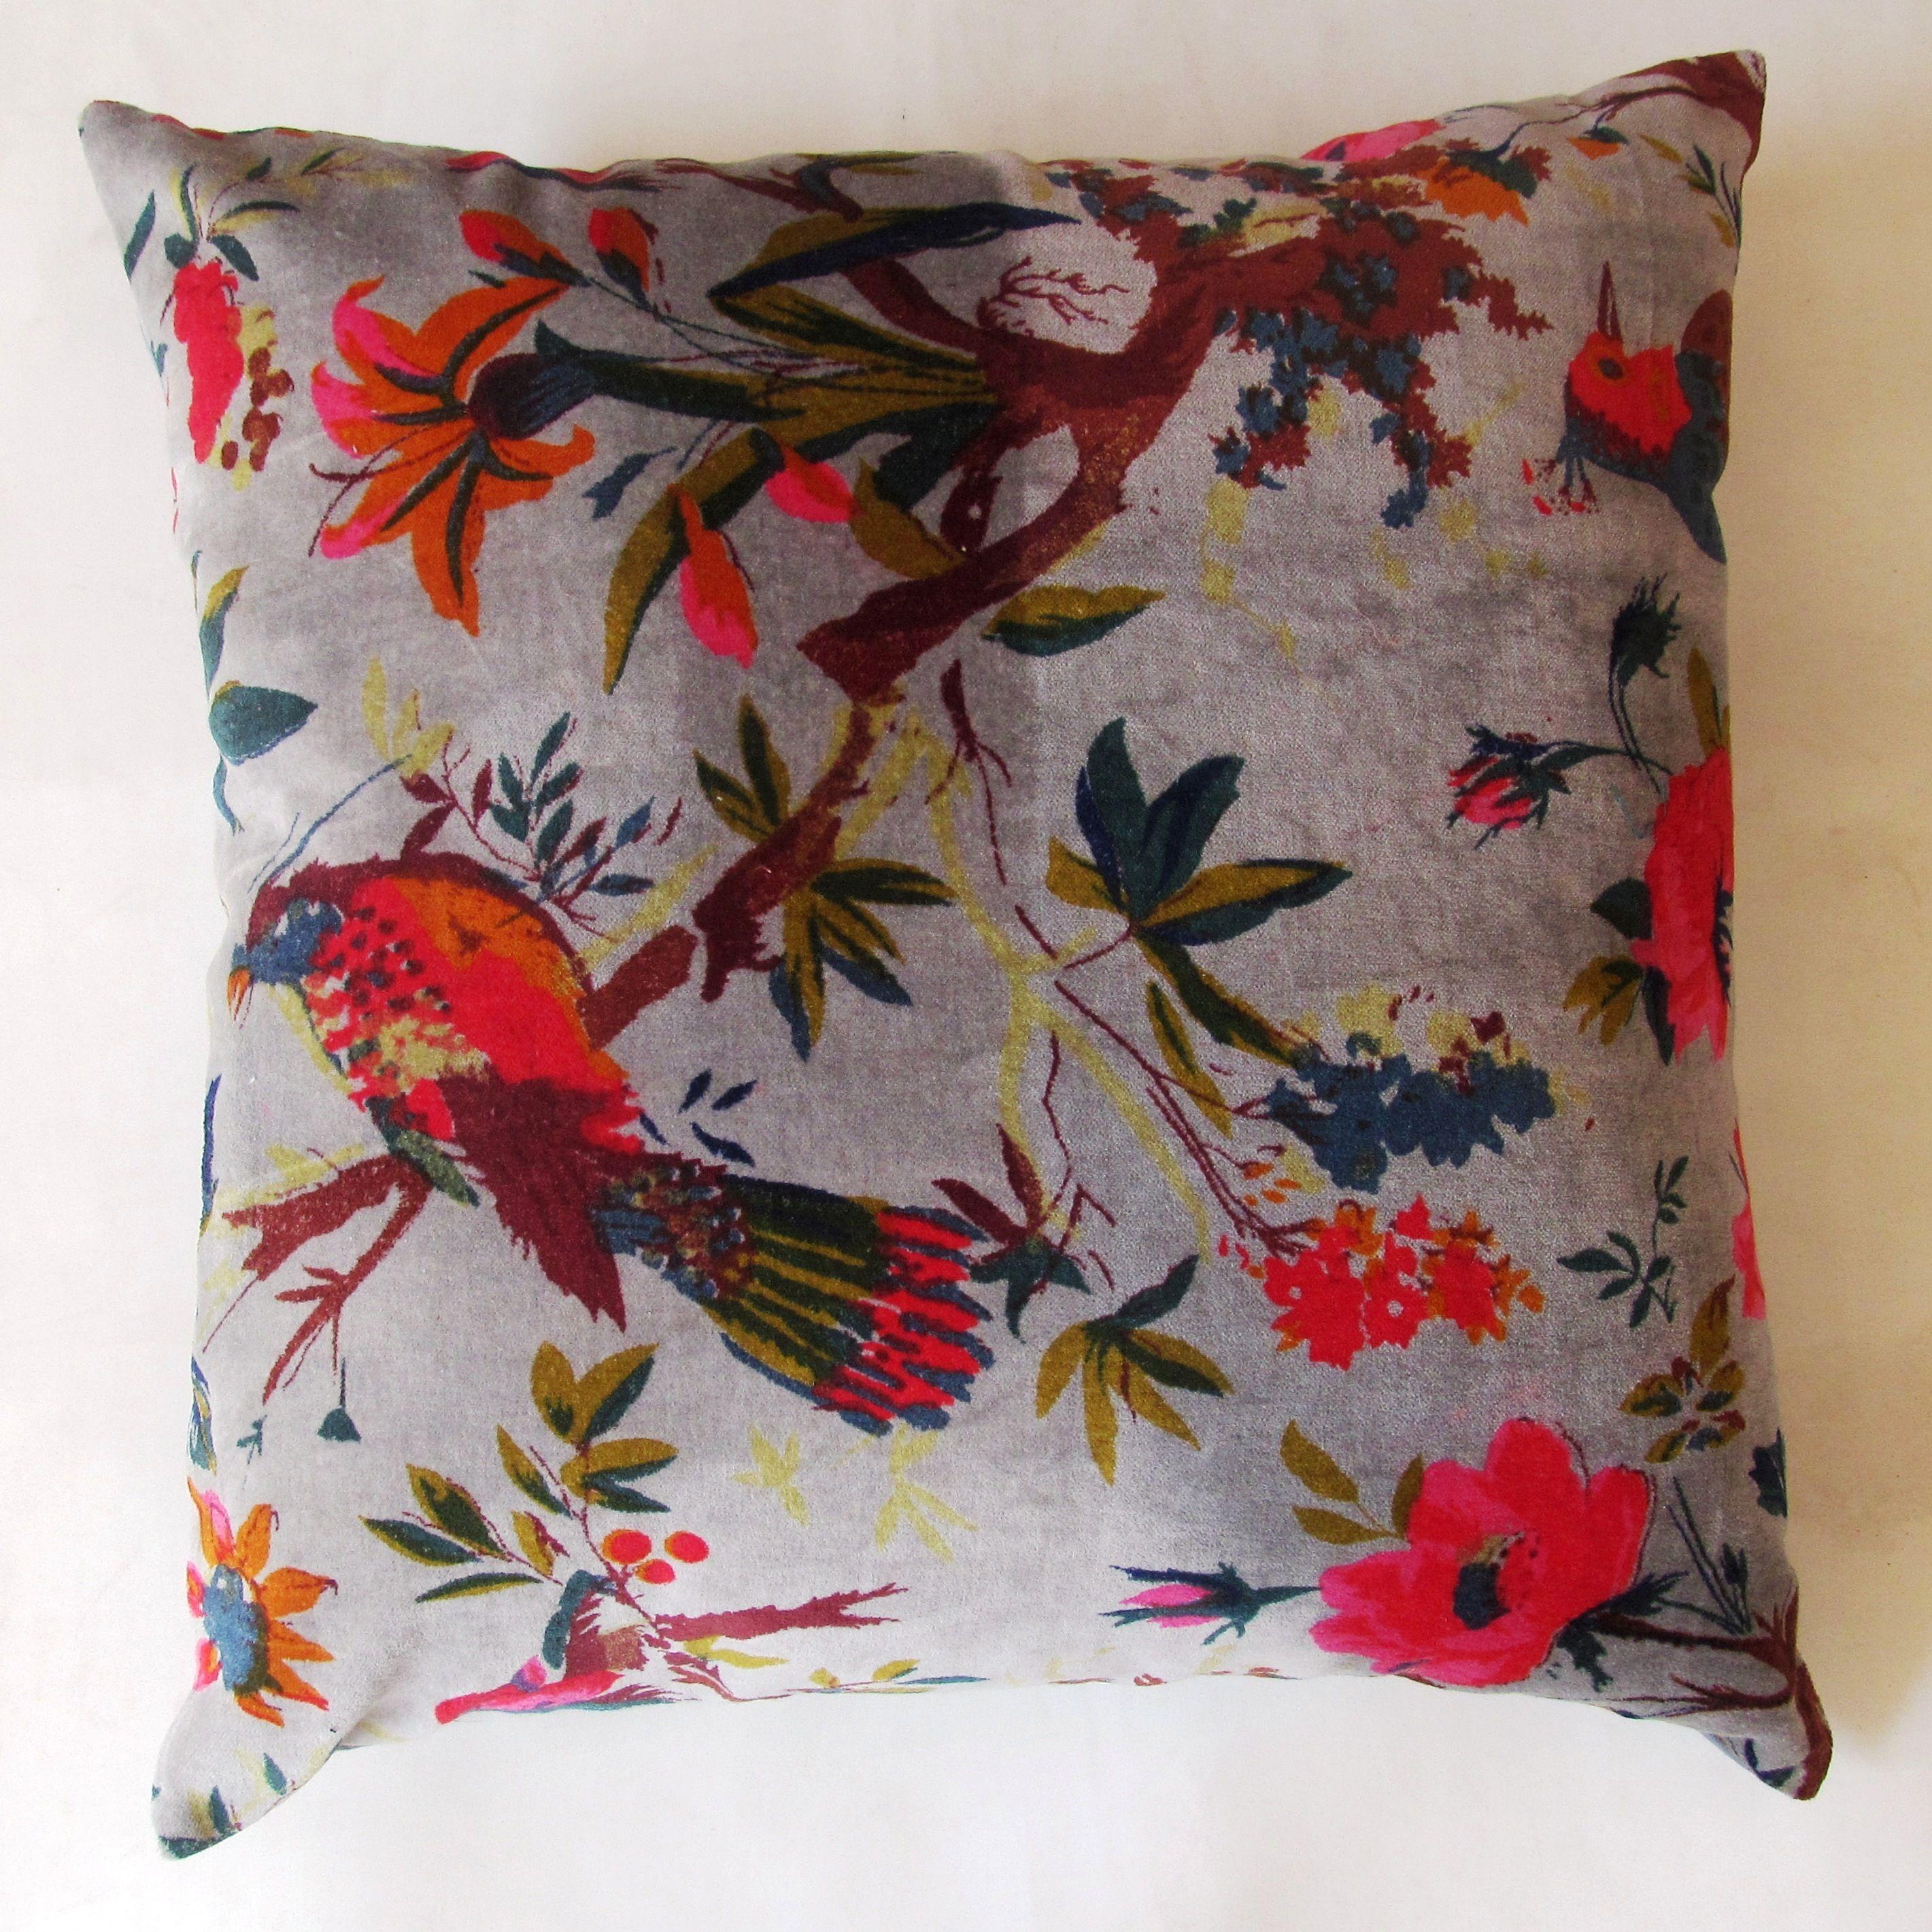 Bird Print Velvet Cushion Covers Size 40 X 40 Cm Rs 190 Piece Id 12208912162